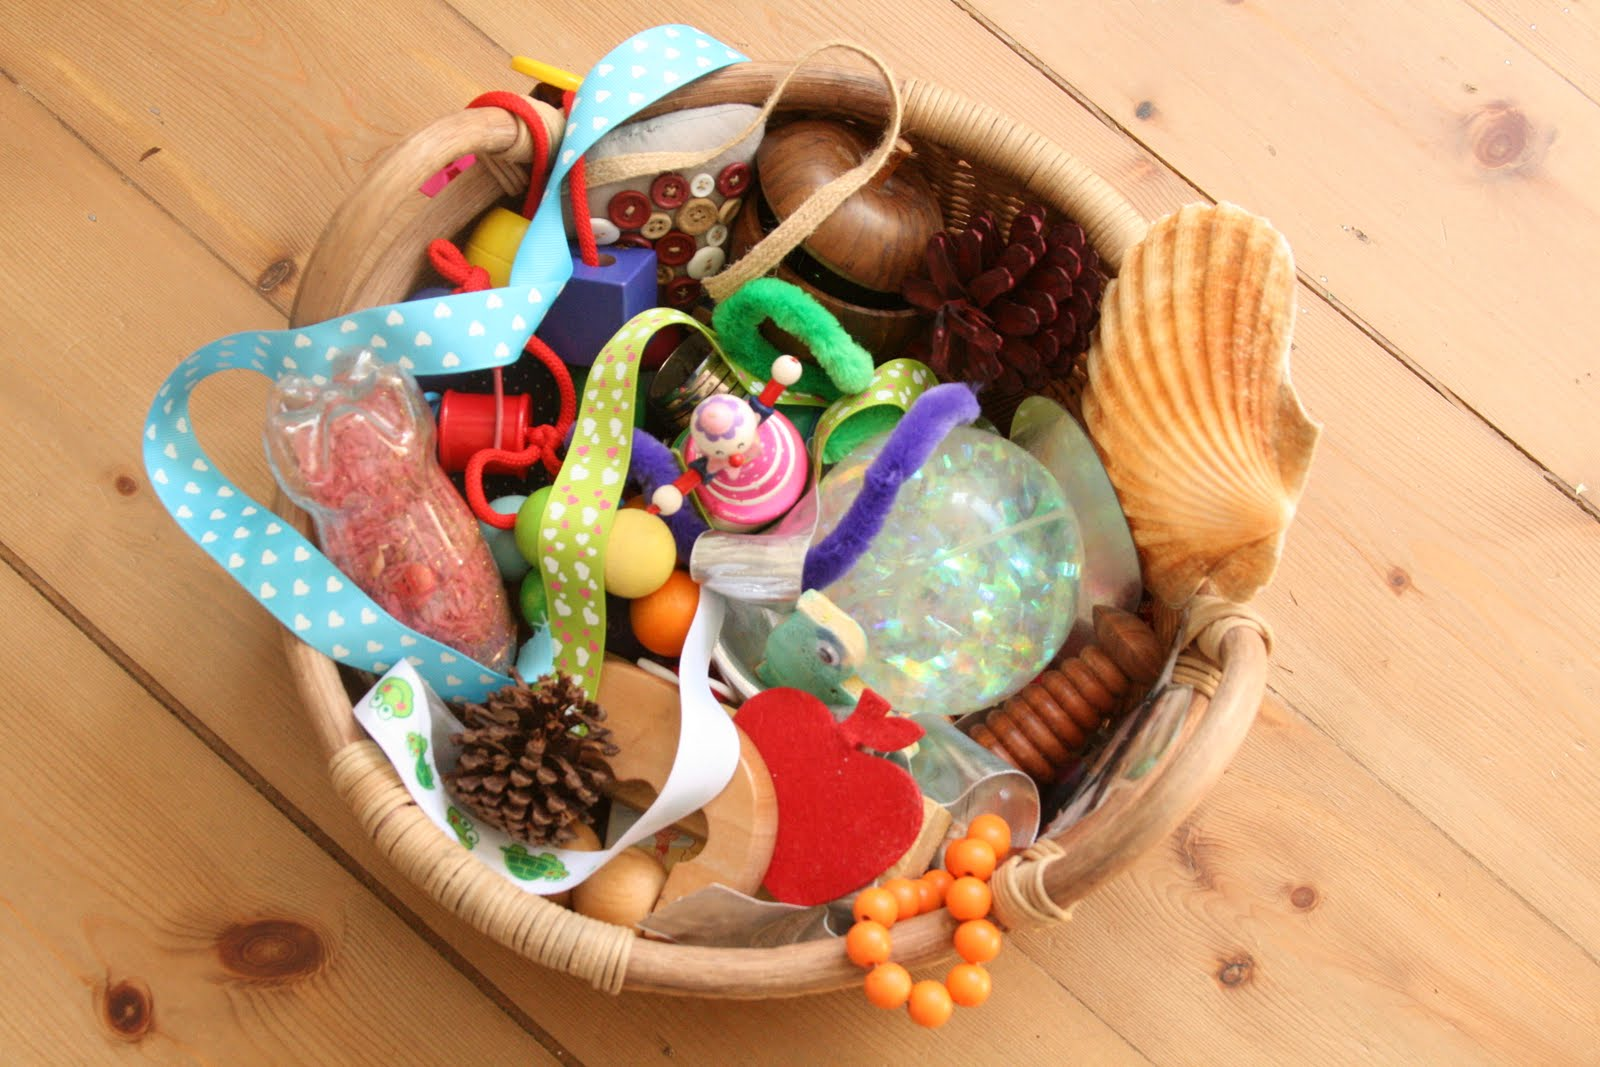 Baby Treasure Basket 12 Months The Imagination Tree